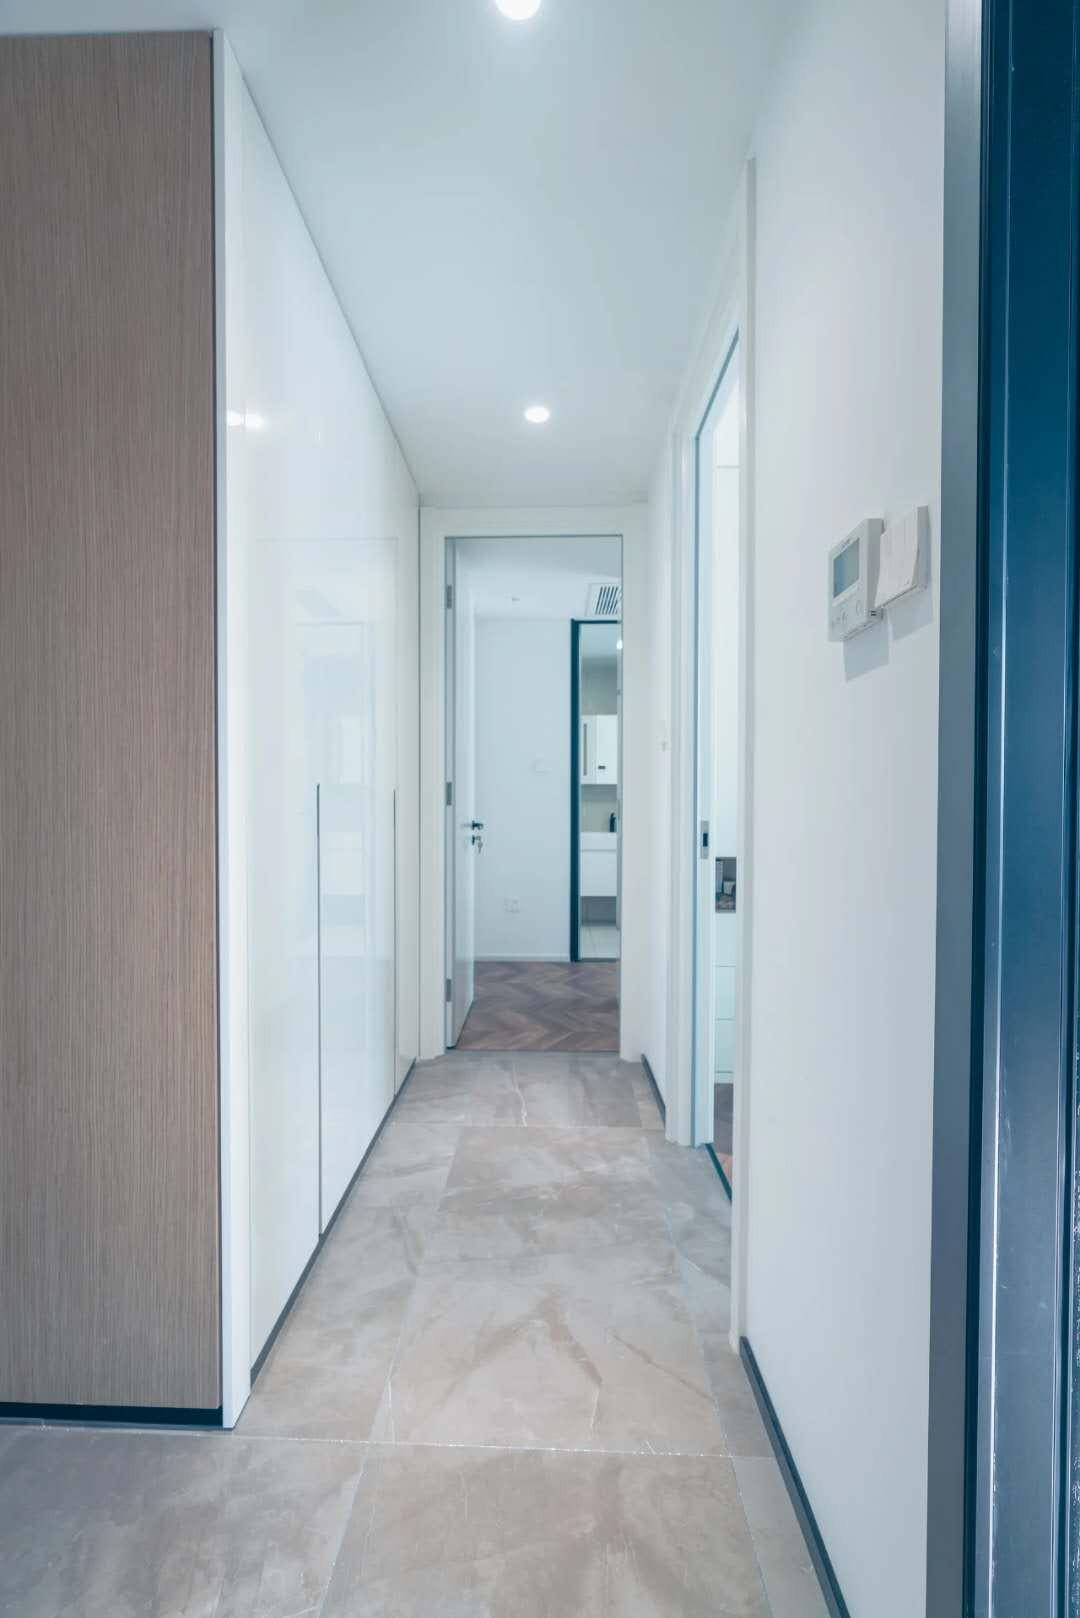 Hallway tile flooring cutom hidden storage cabinet wall